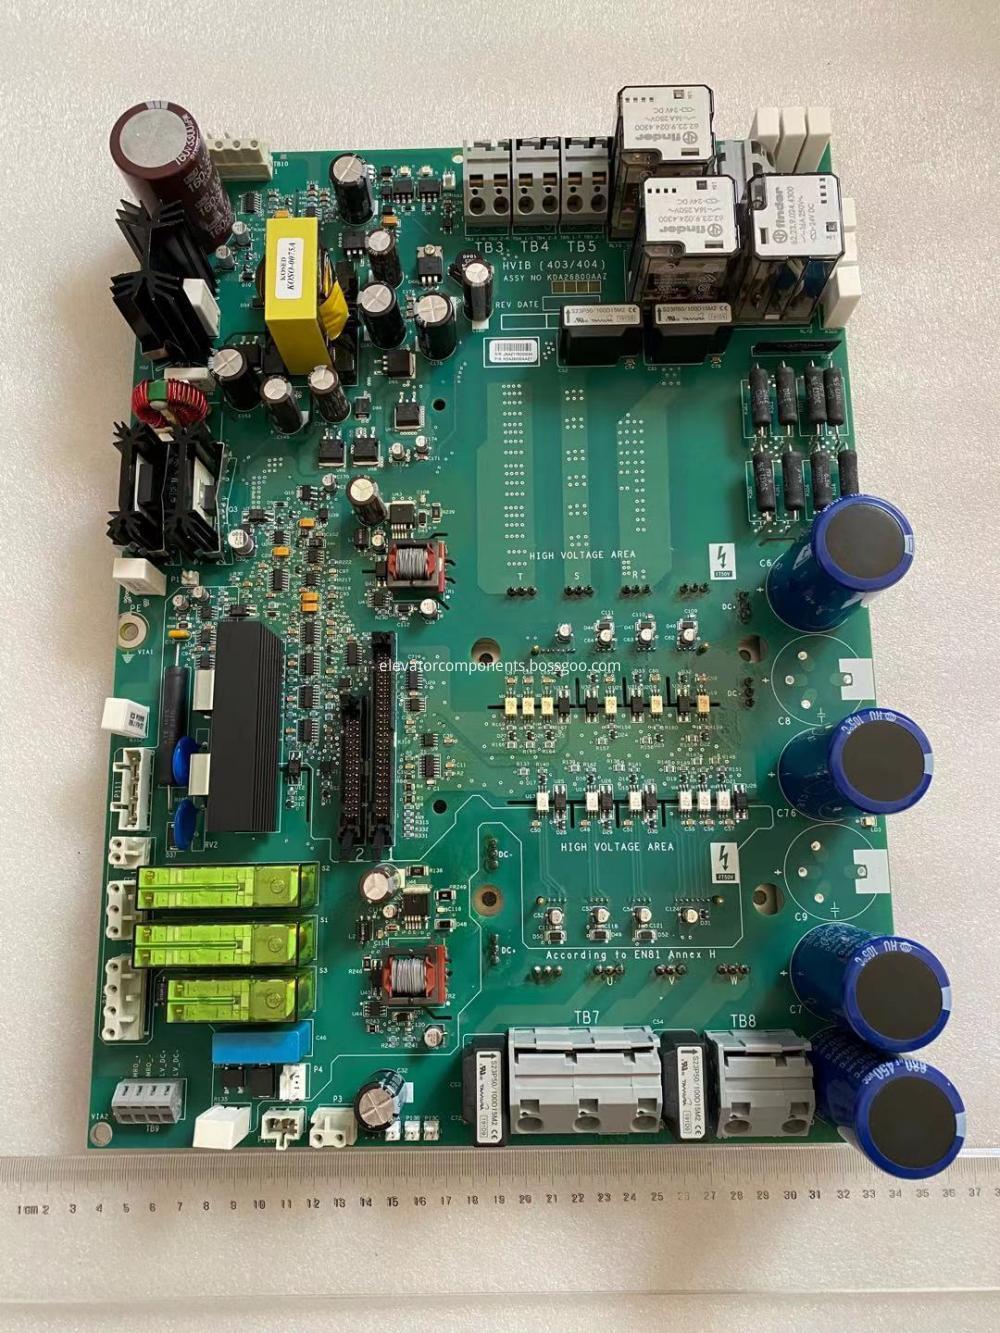 KDA26800AAZ1 PCB Assembly for OTIS Elevator OVFR2B-403 Drive